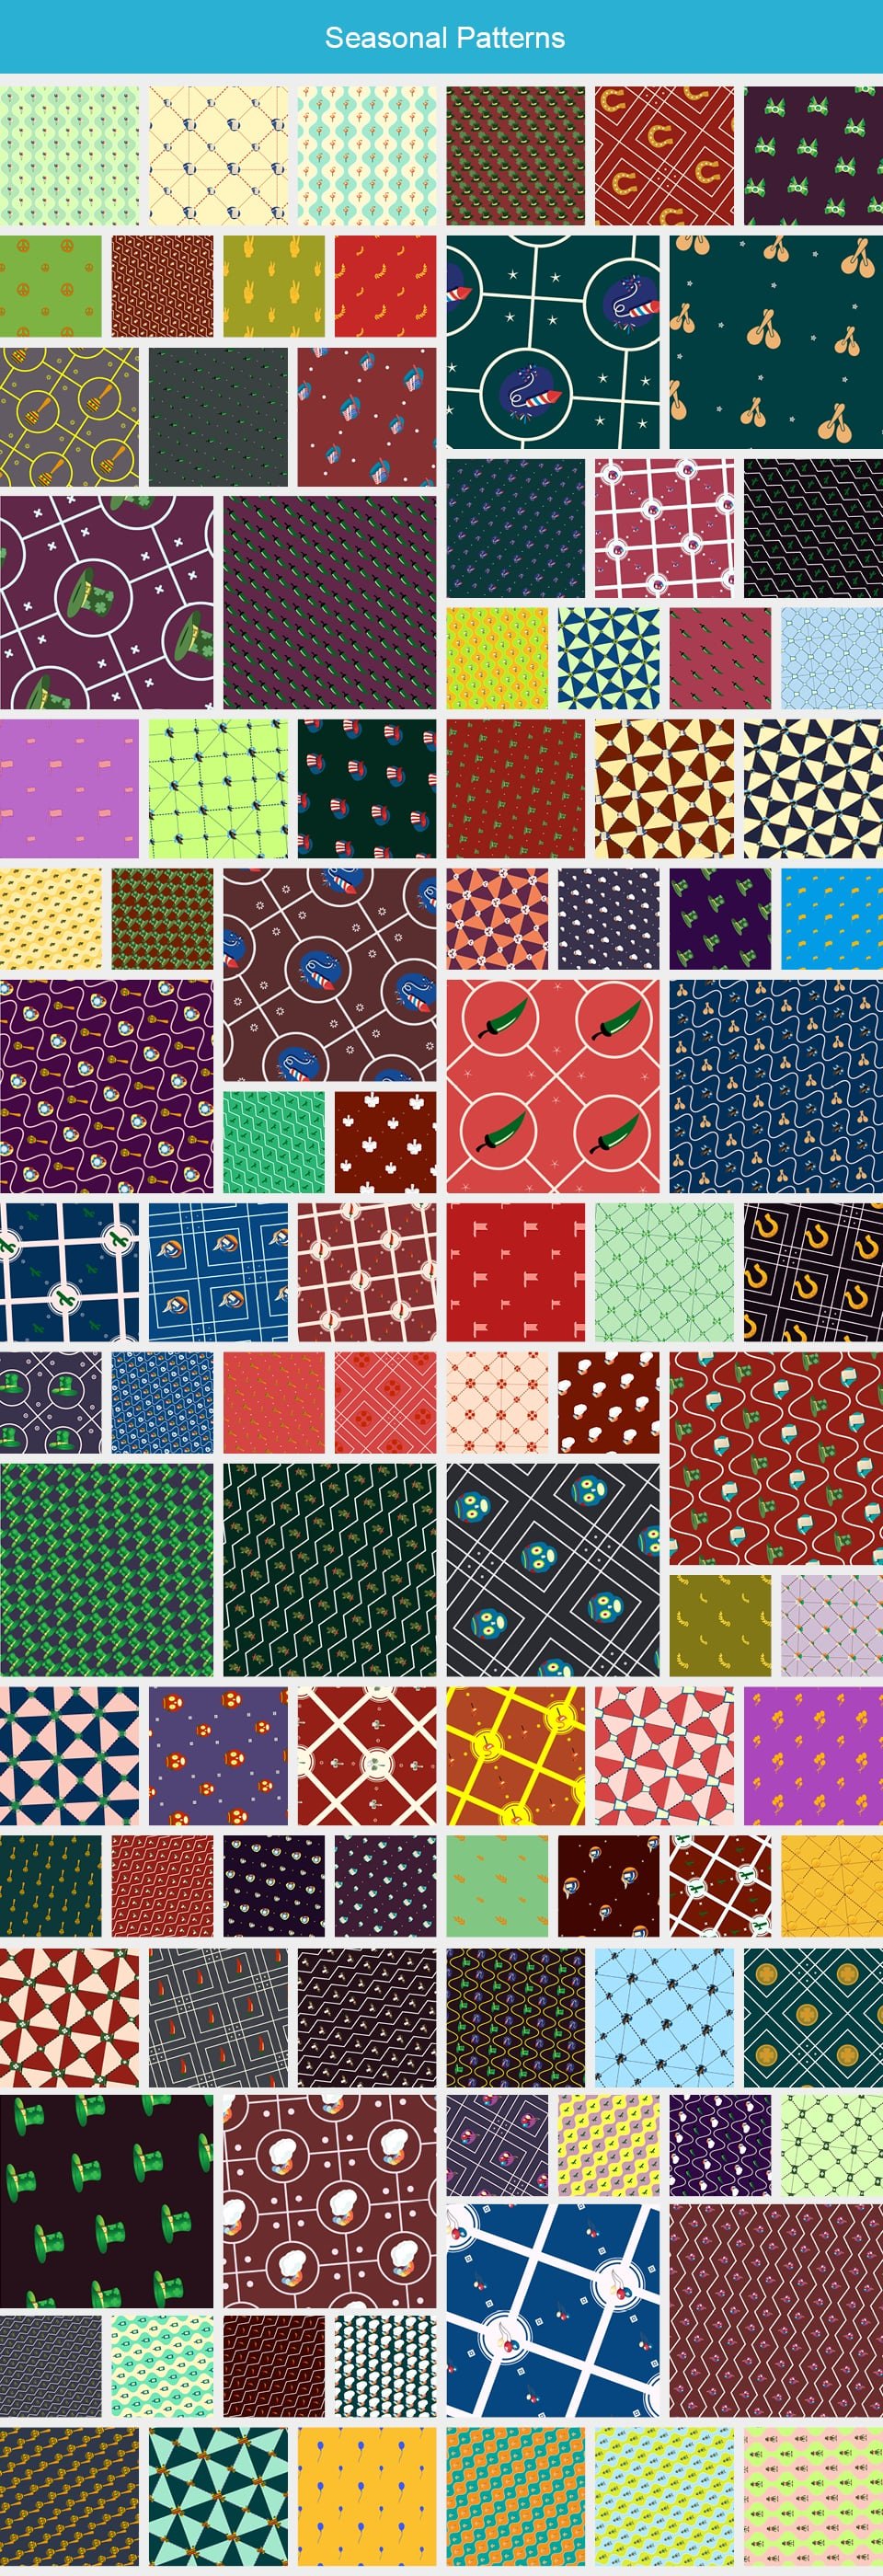 Modern Pattern Designs - Mega Bundle with 2000 Patterns - Large Preview Seasonal